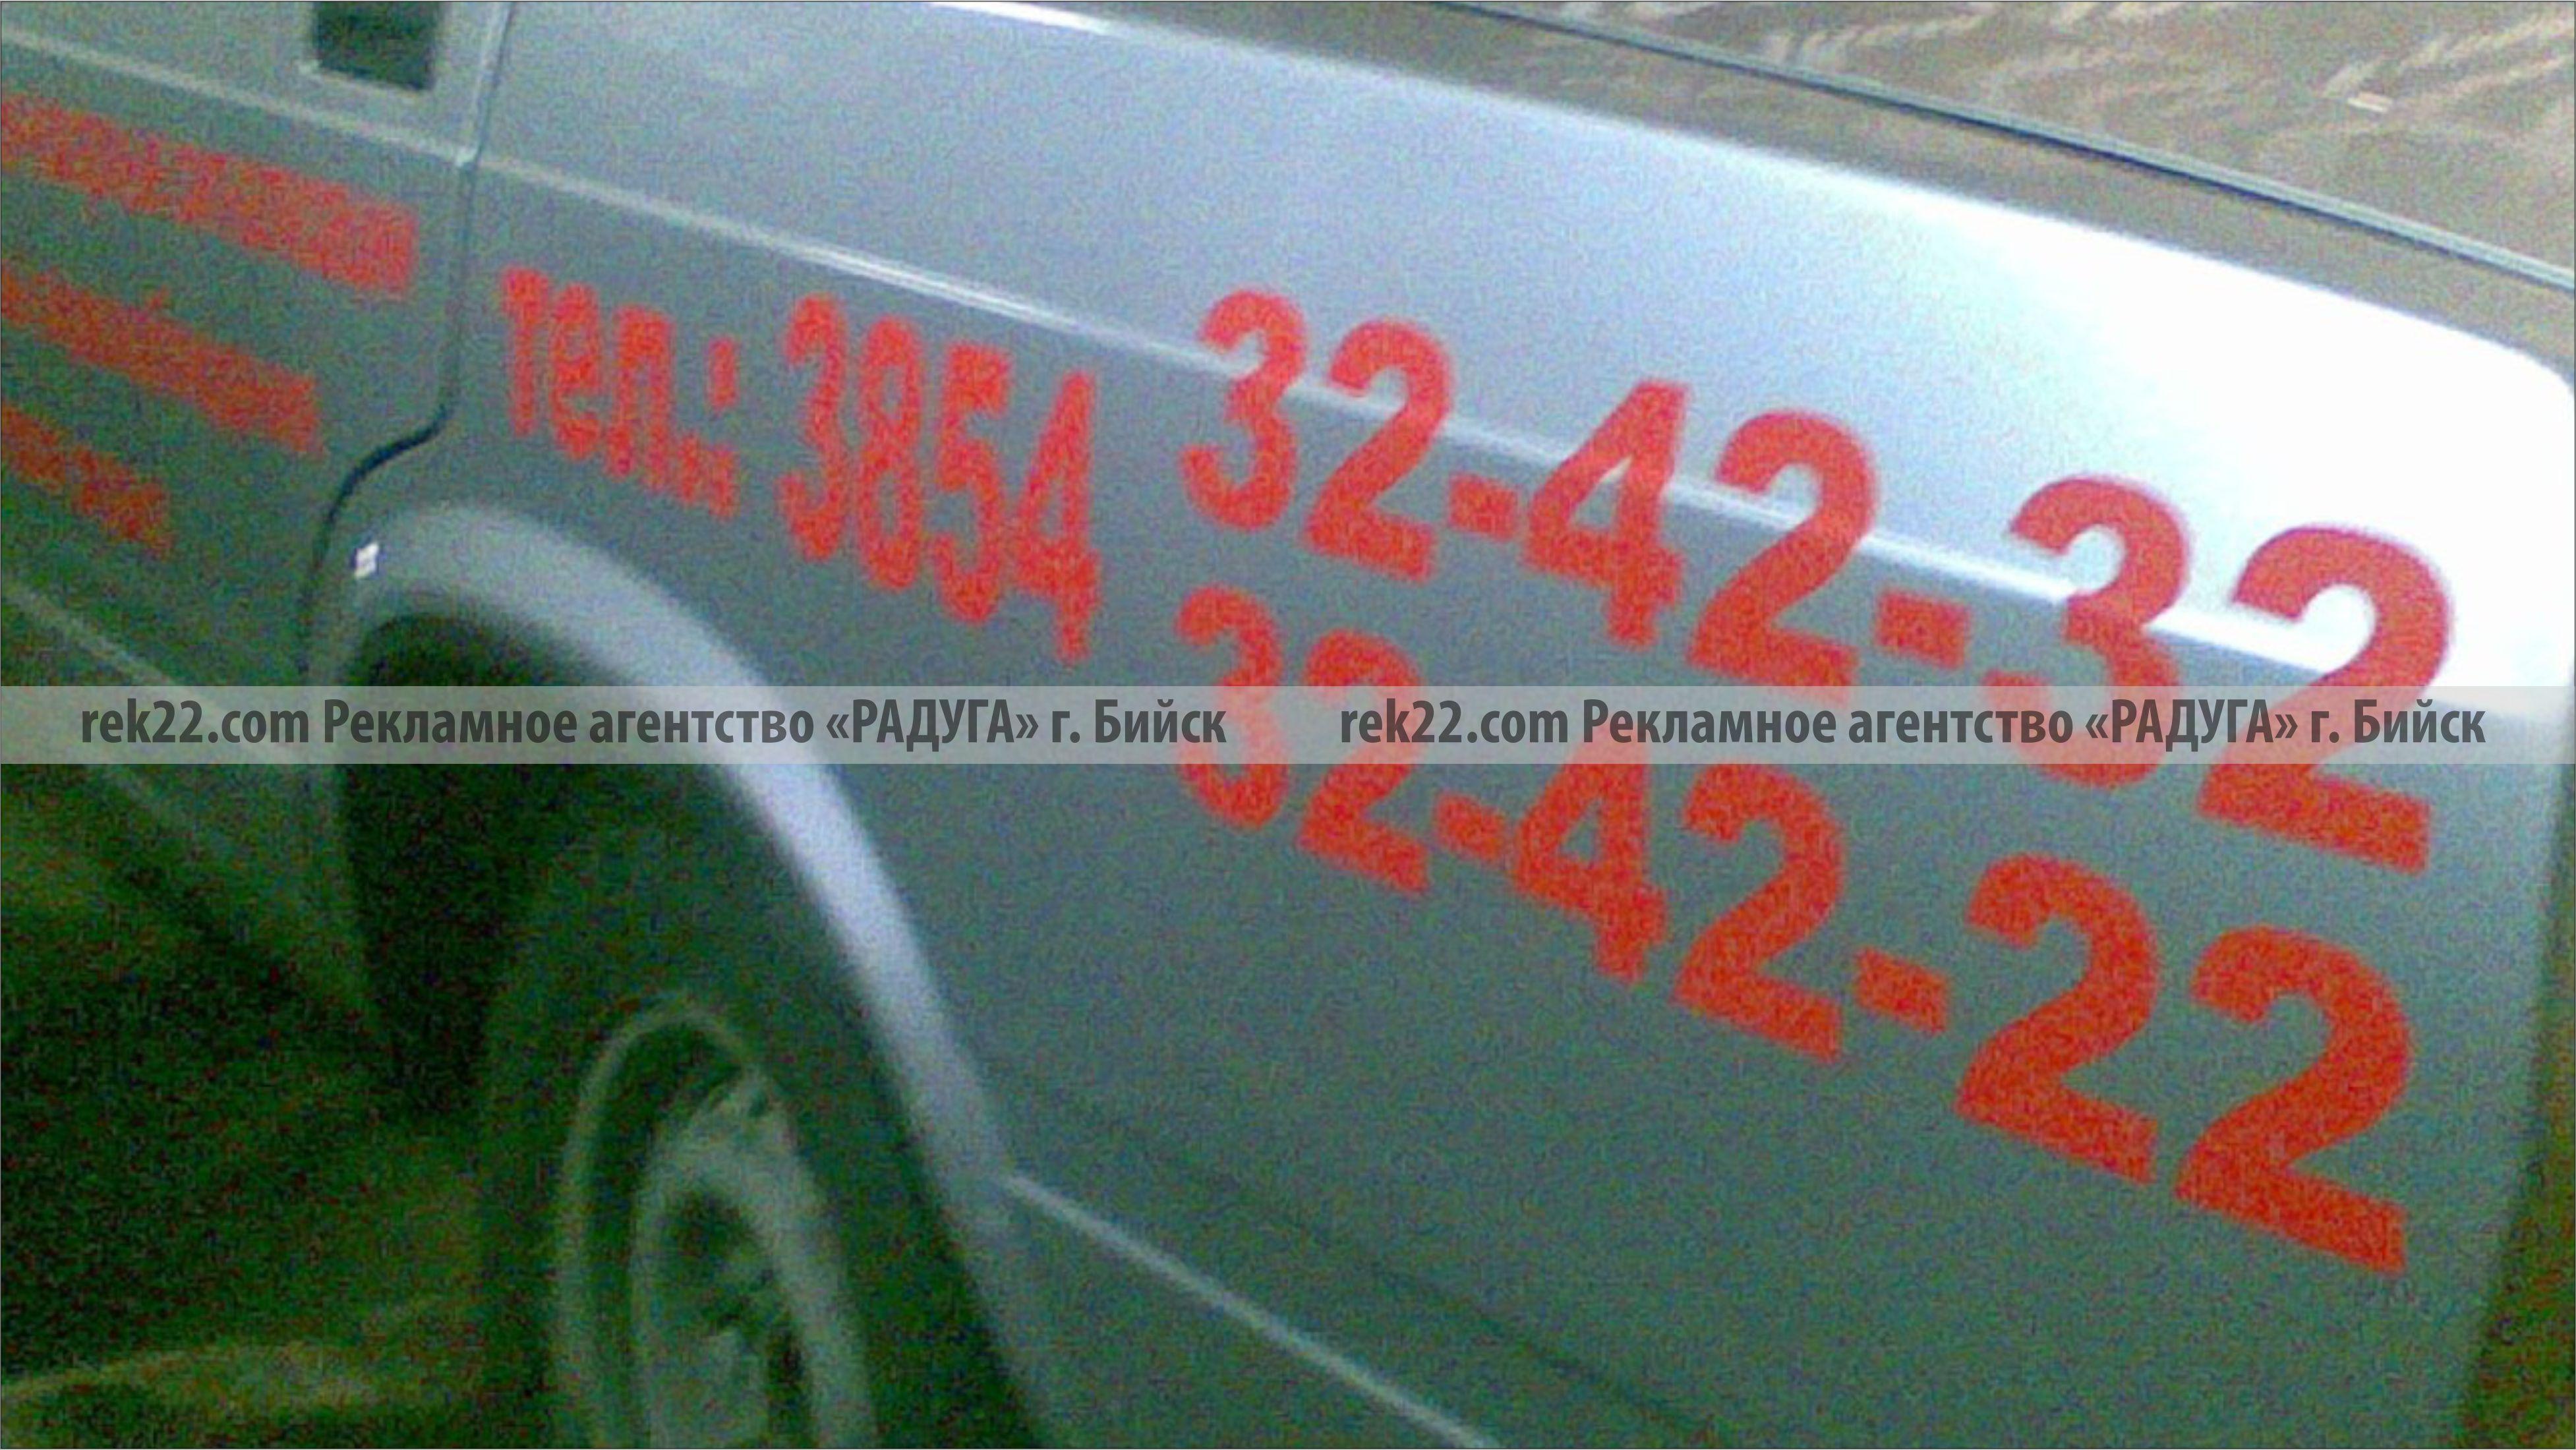 Реклама на транспорте Бийск - оклейка авто - 5.1